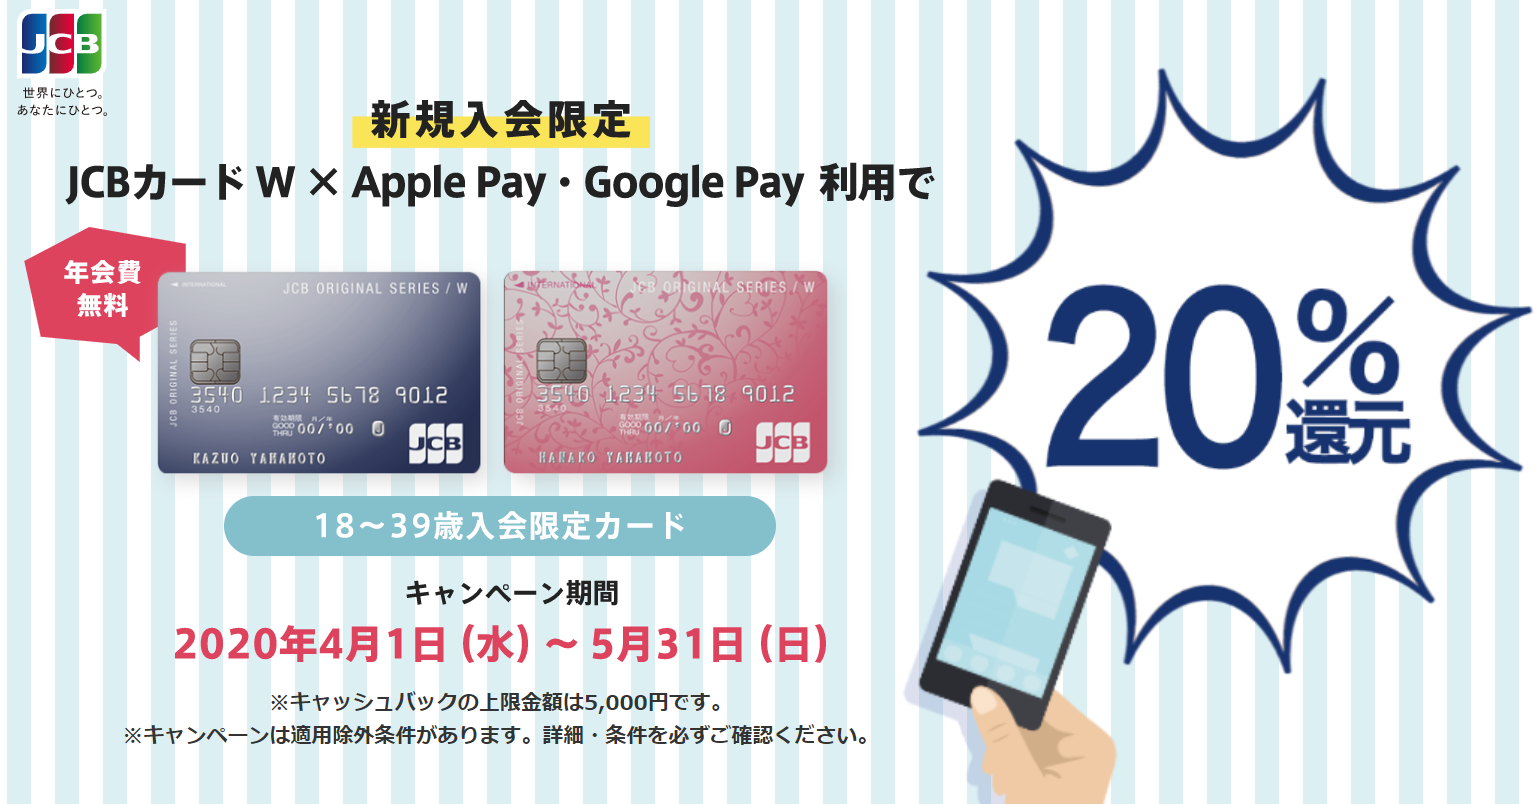 PayPay_20%還元キャンペーン_JCB